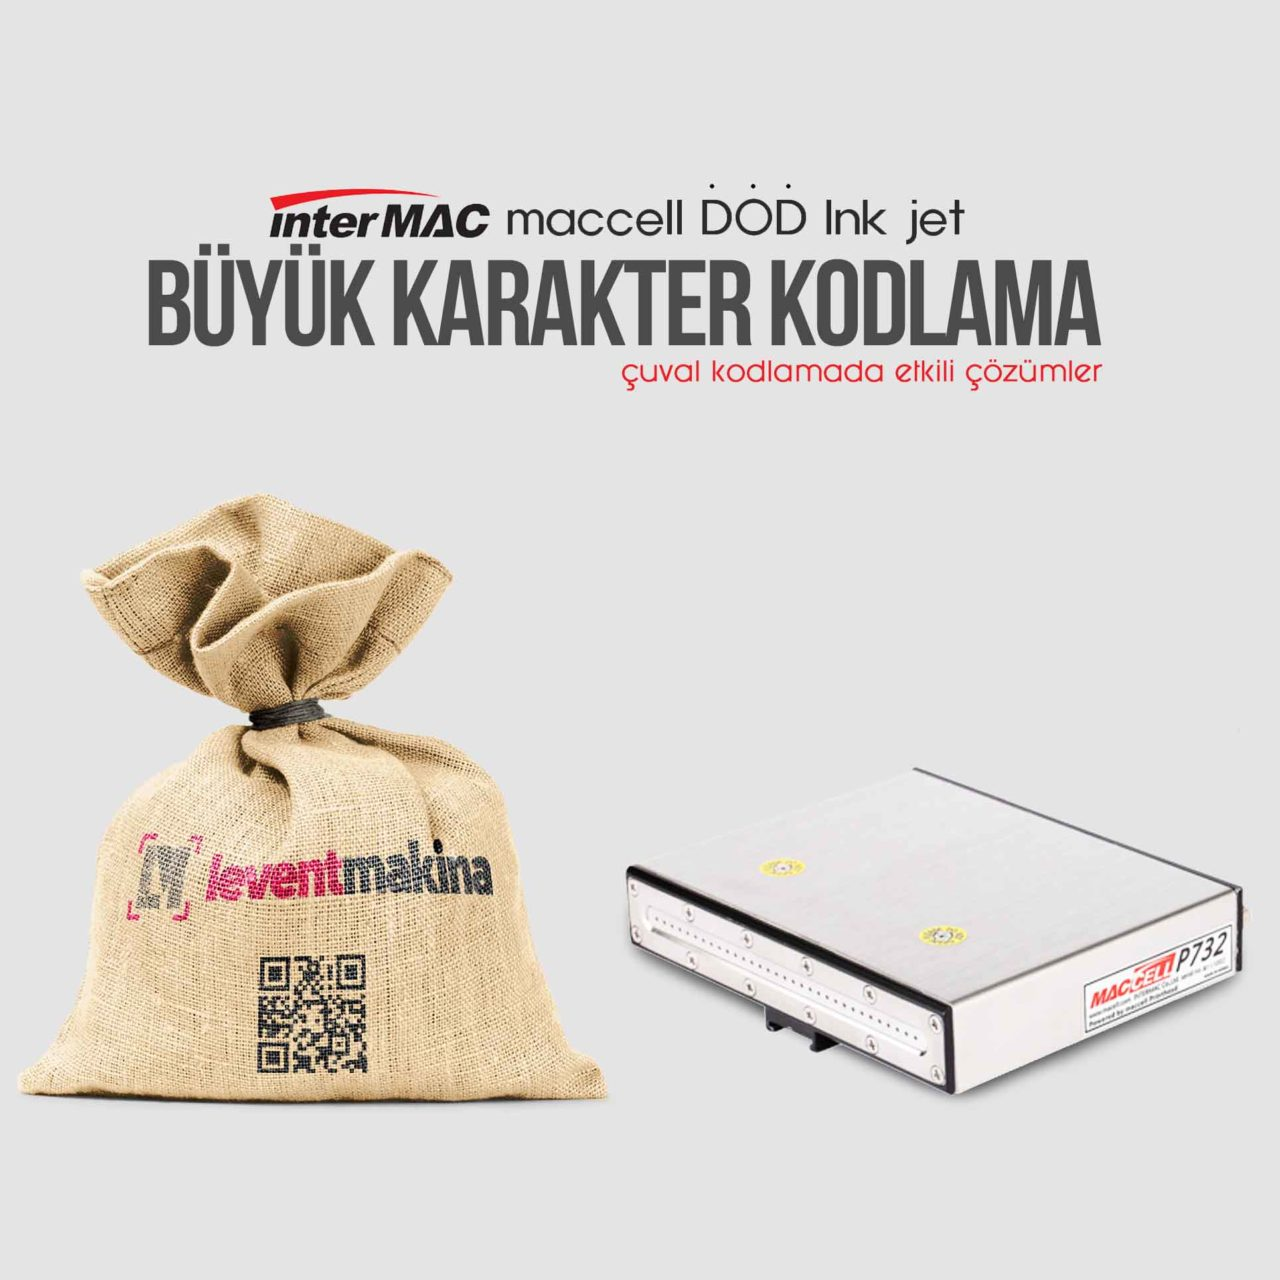 https://leventmakina.com.tr/wp-content/uploads/2020/07/buyuk-karakter-kodlama-1280x1280.jpg